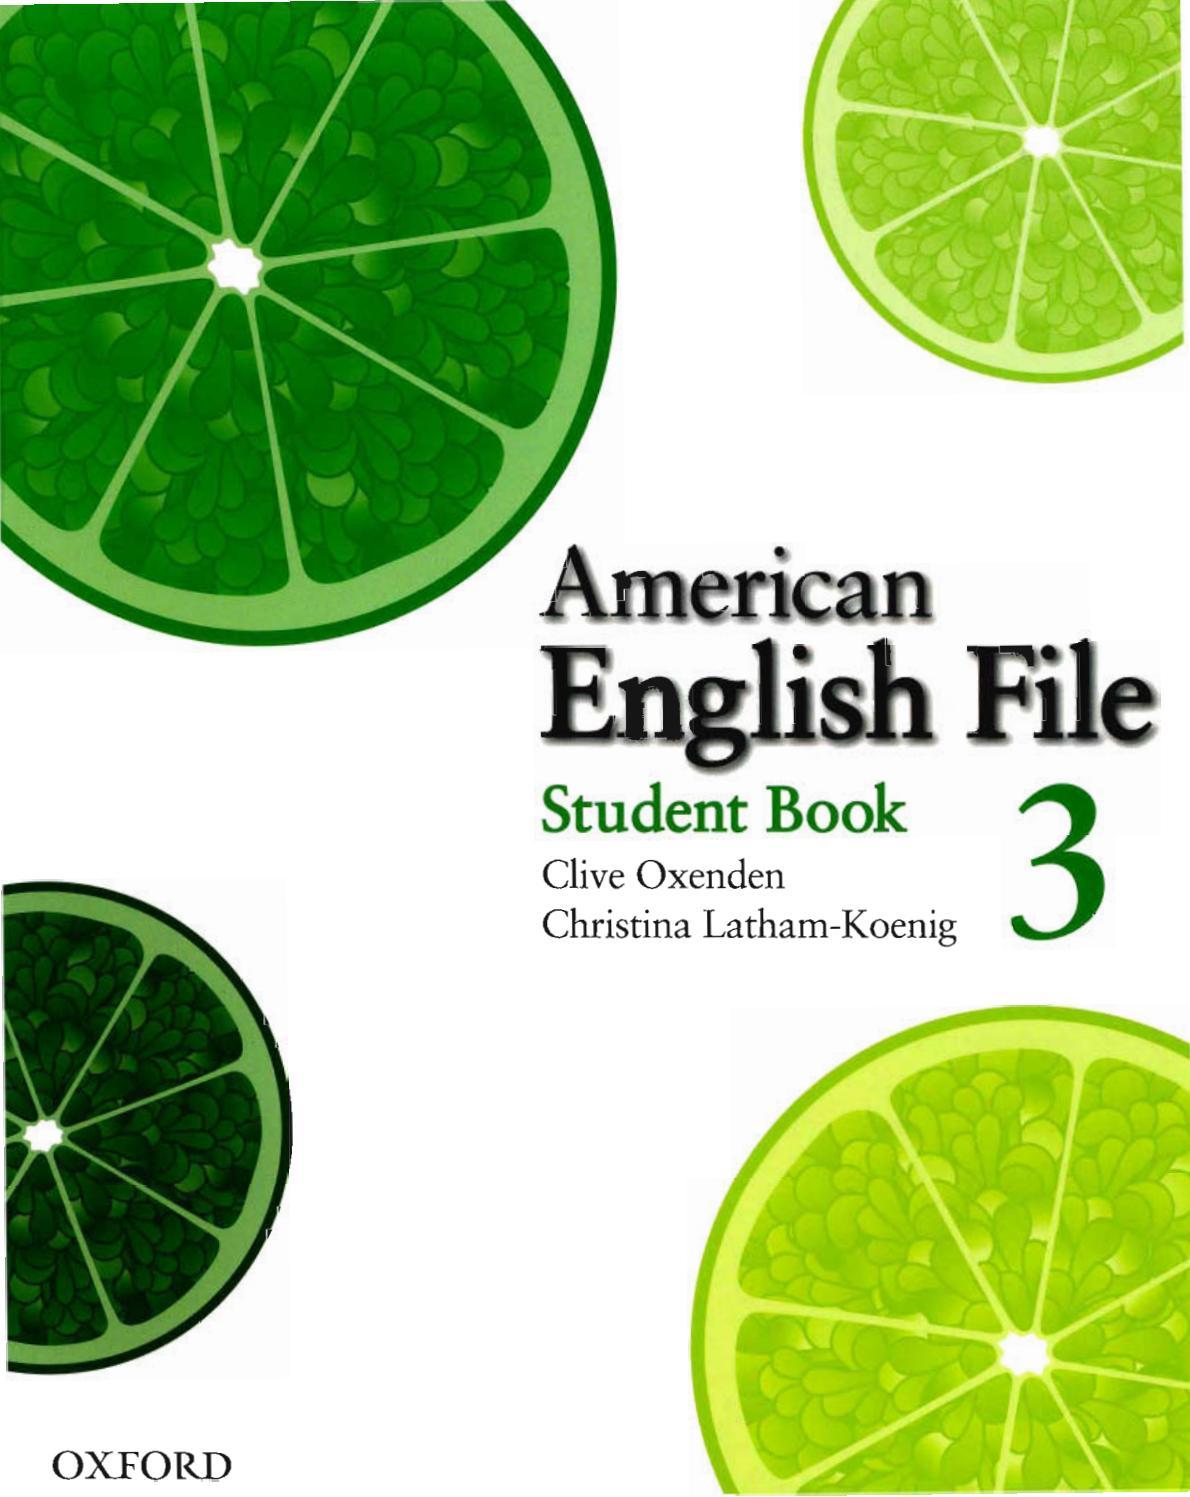 American English File 3 By Margaritaclavel18 Issuu [ 1497 x 1190 Pixel ]